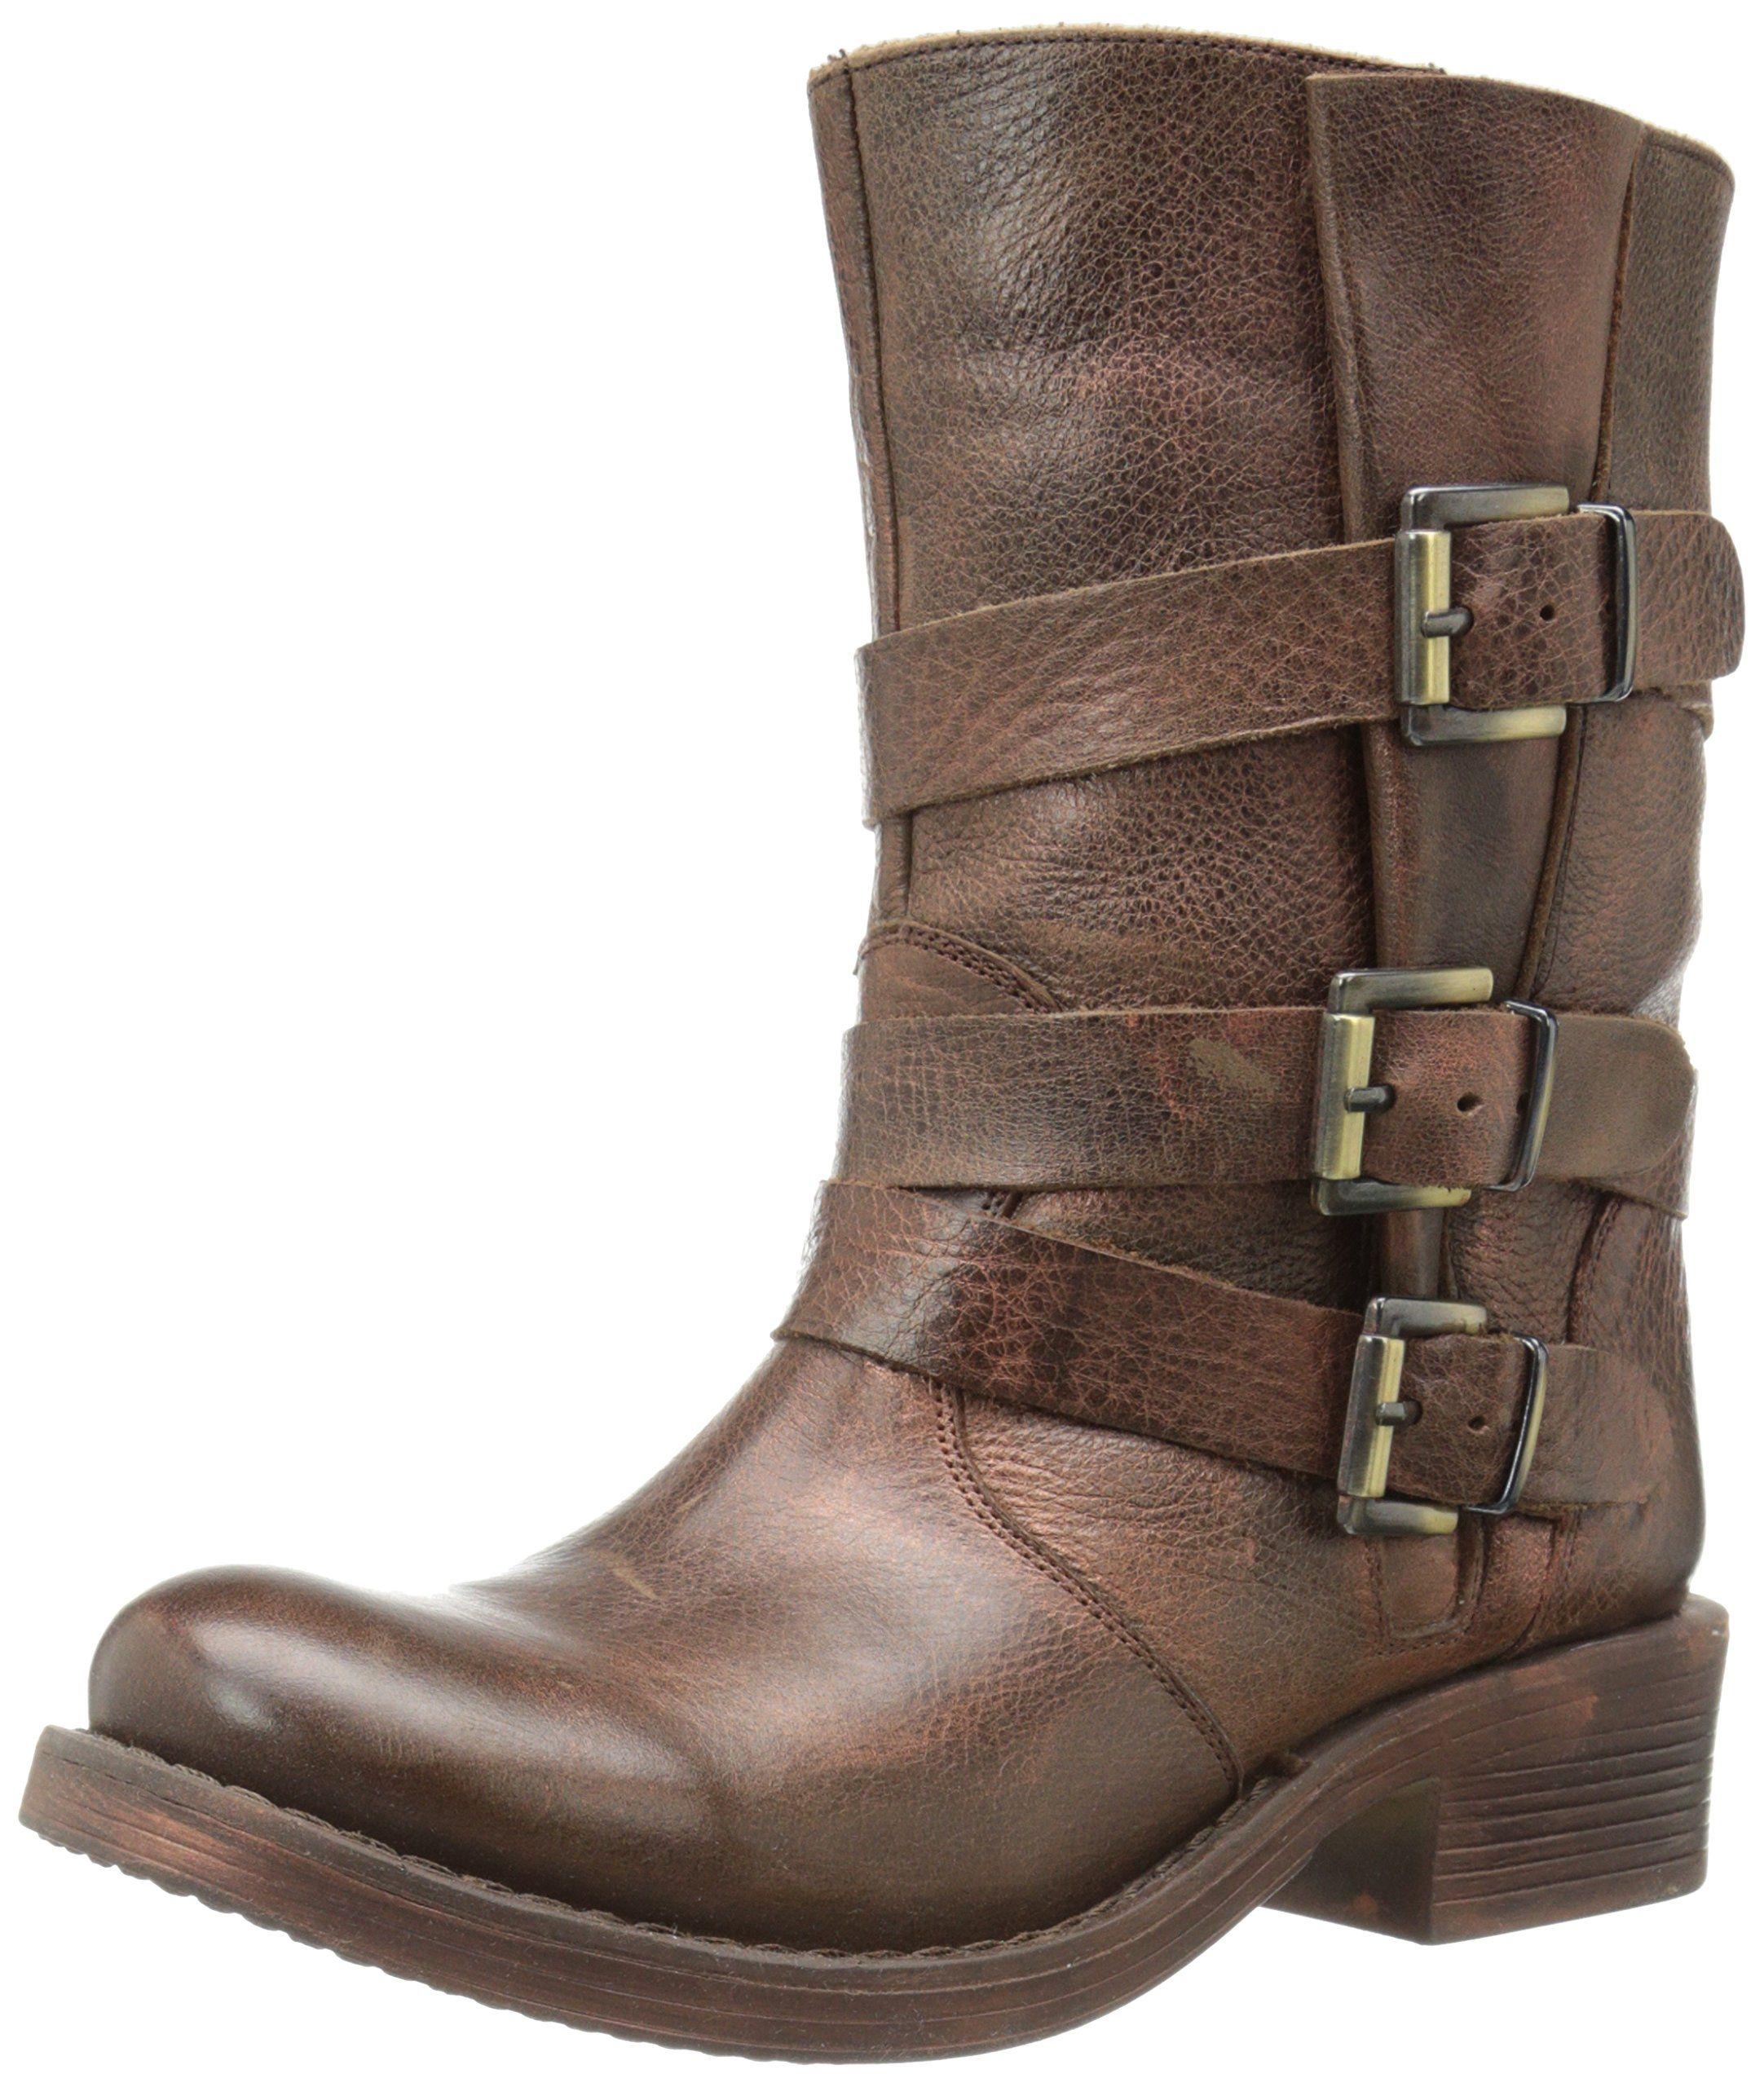 0e834c3e6cf42 Amazon.com: Miz Mooz Women's Clang Boot: Clothing ...